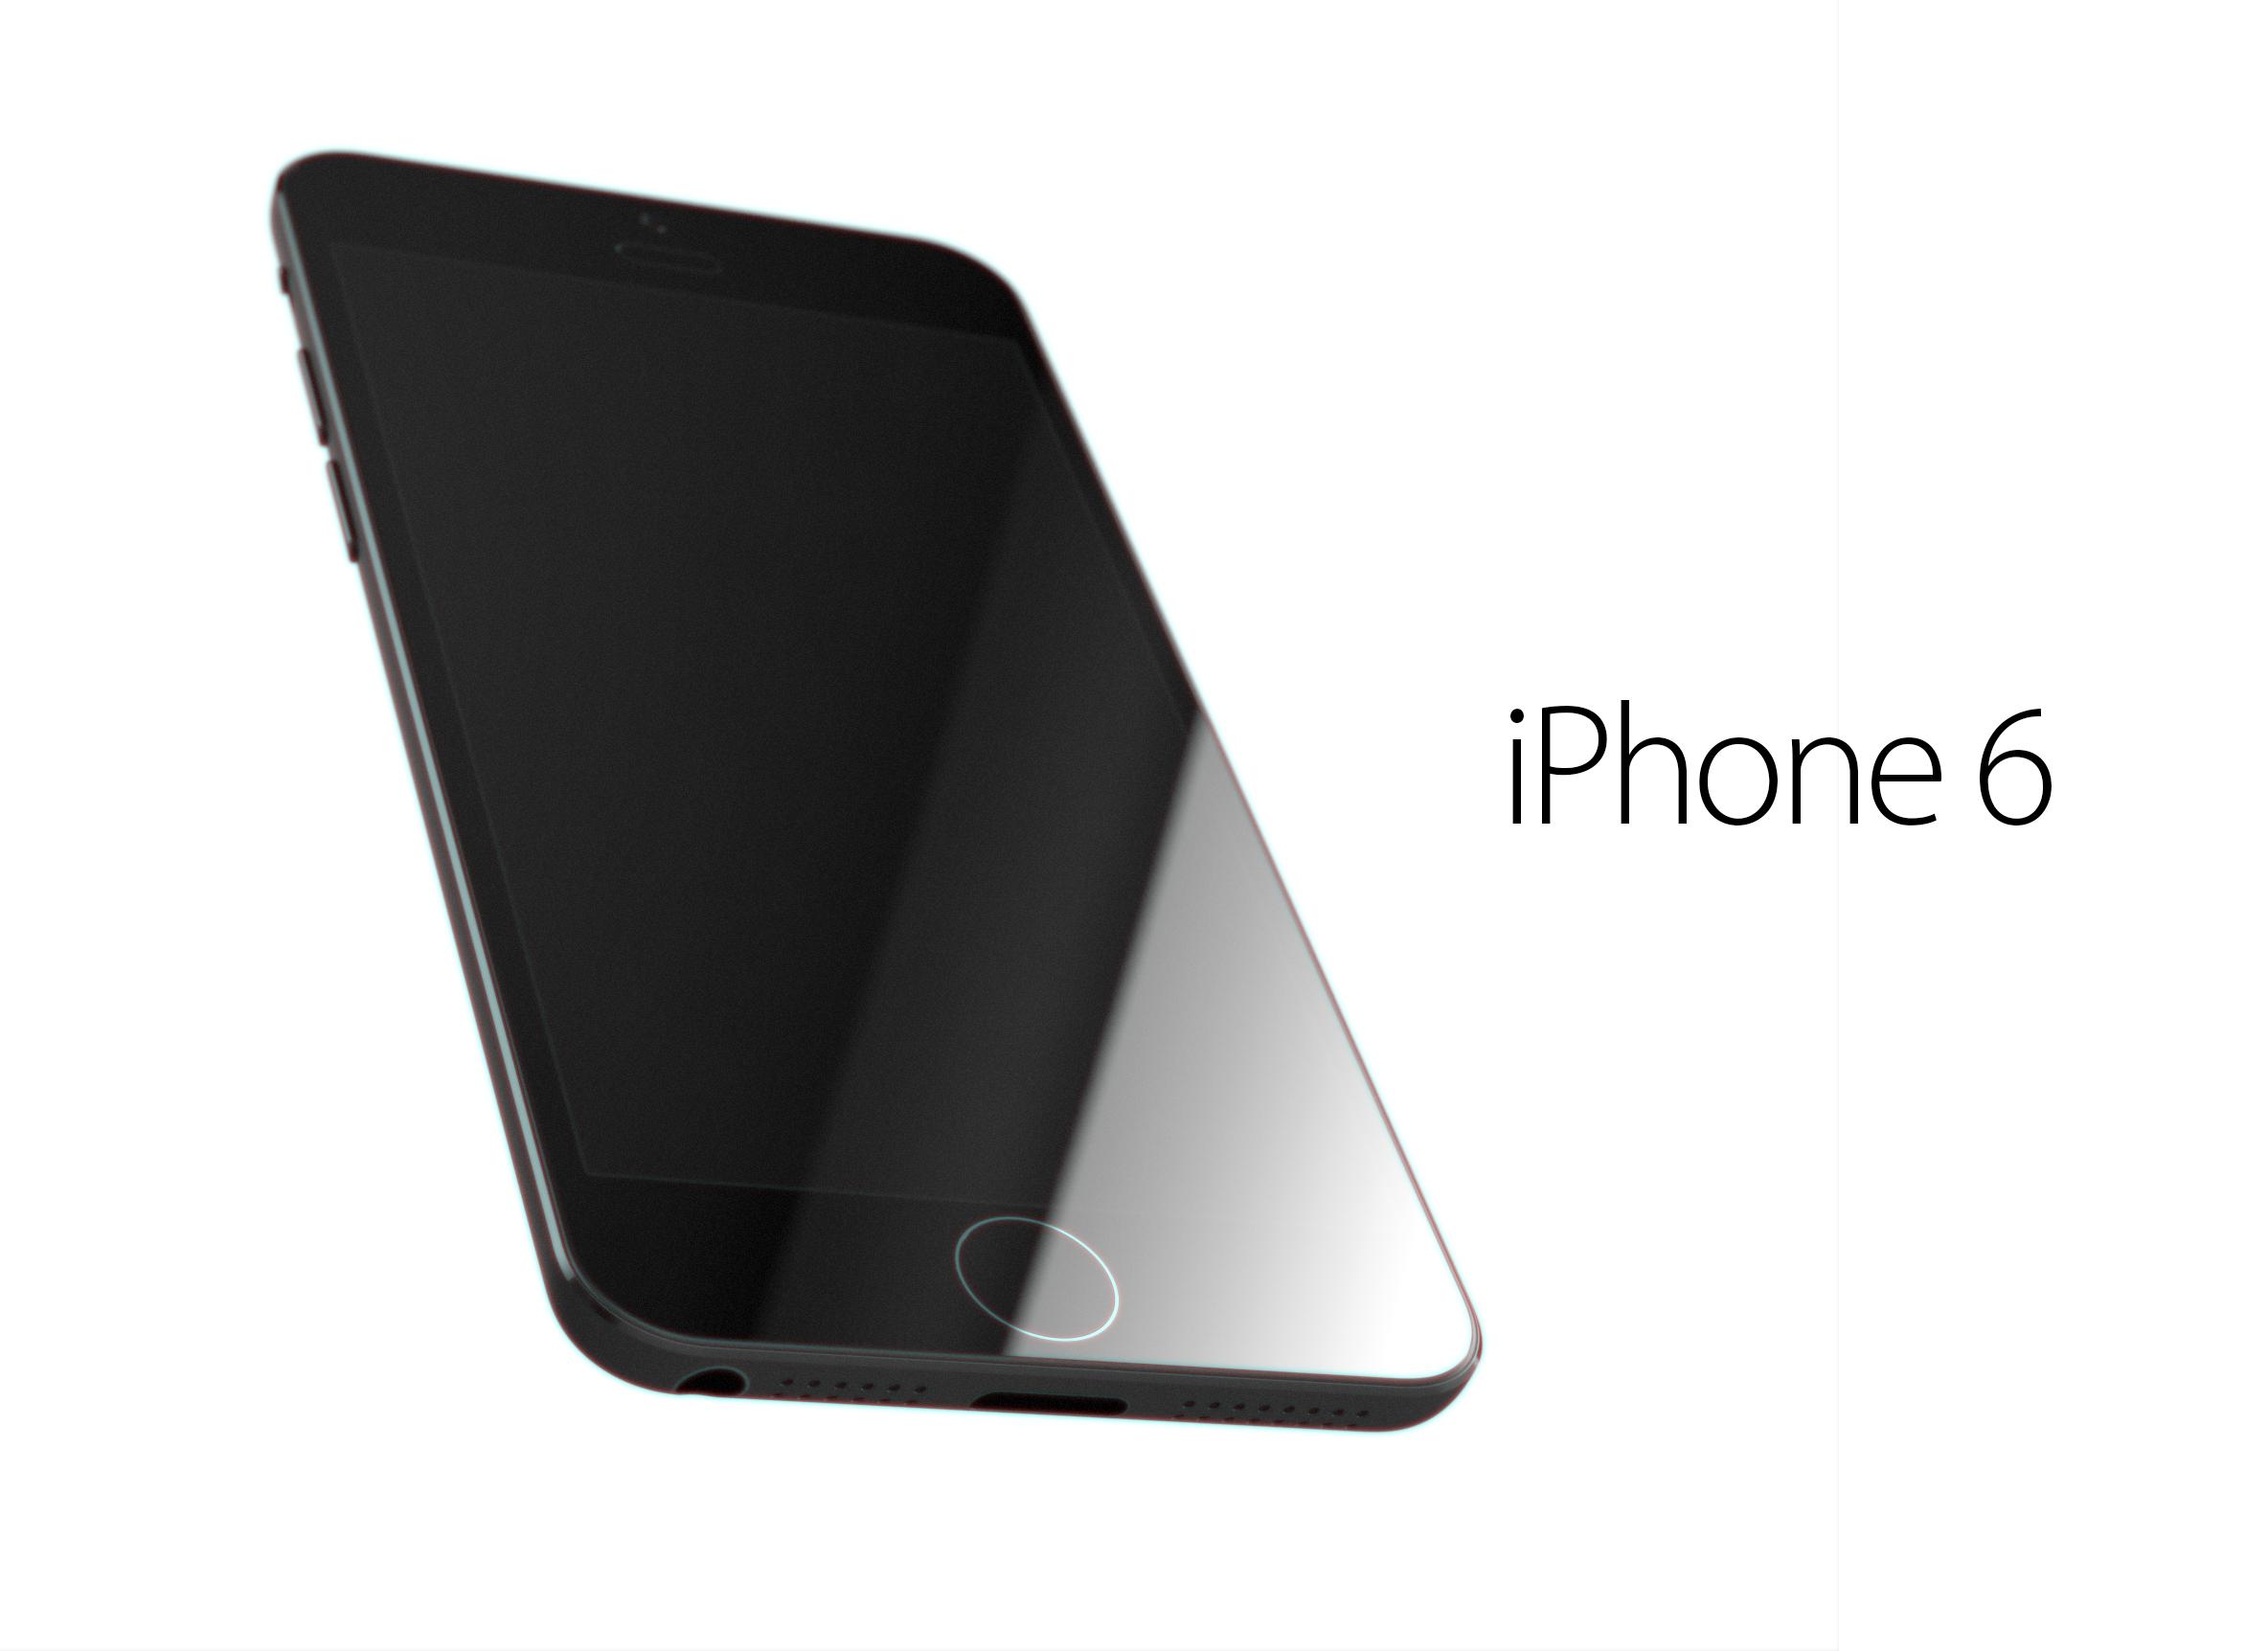 kamera-iphone-6-budet-imet-razreshenie-8-megapikselej